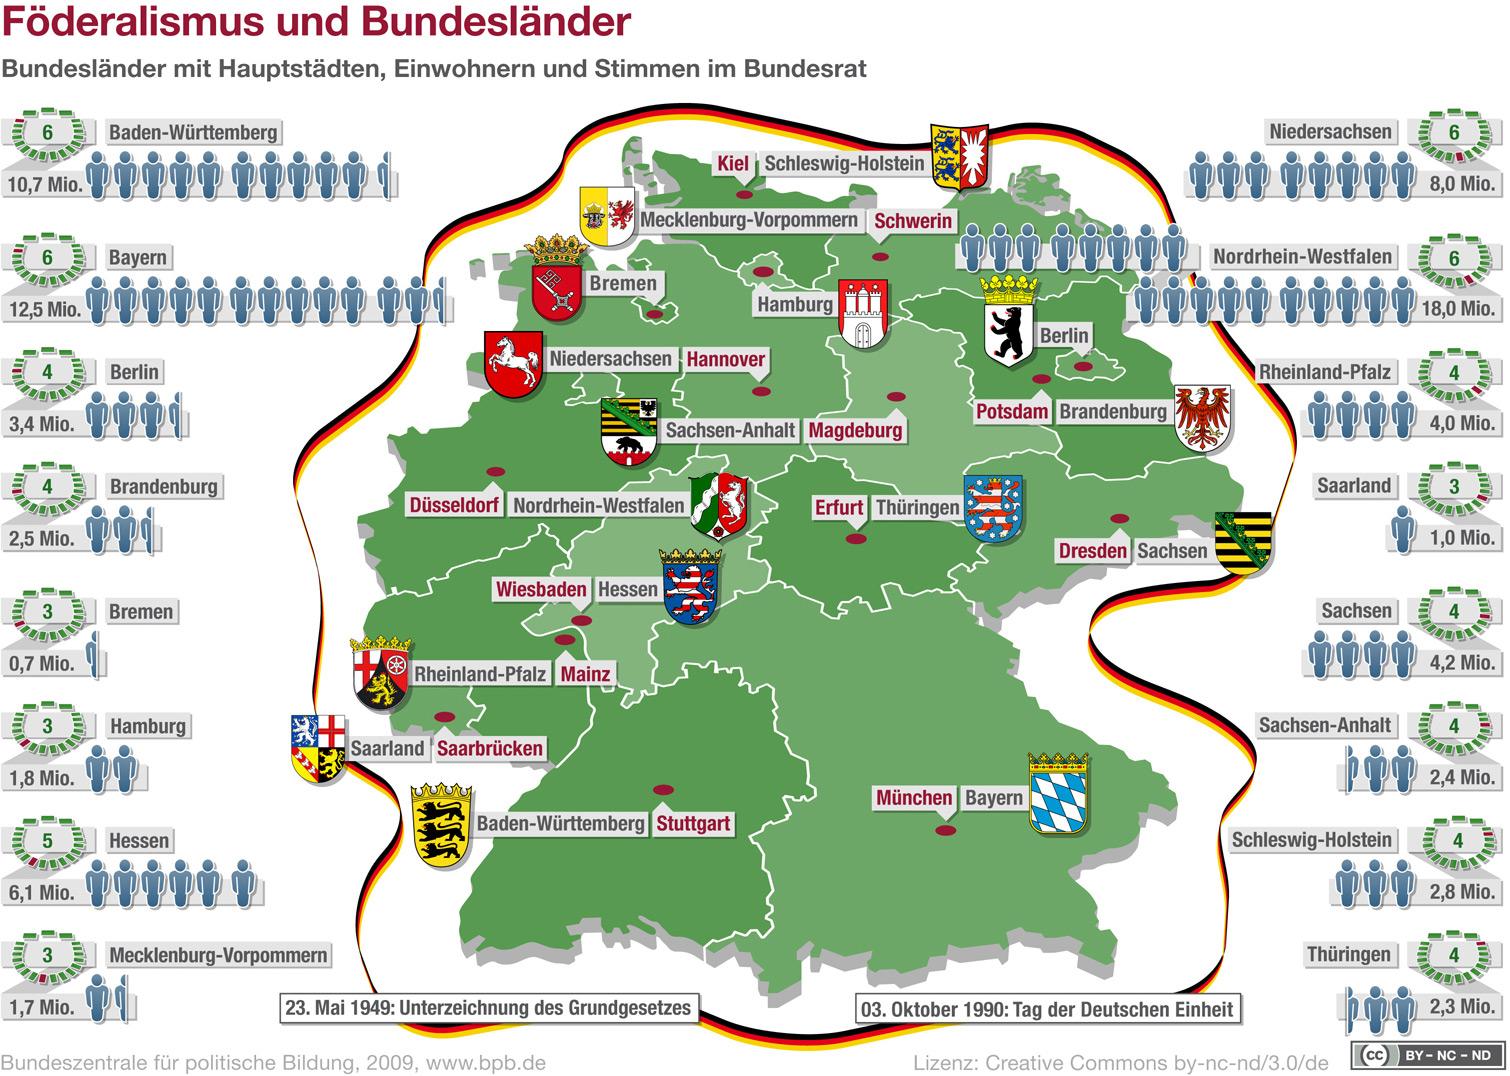 Bundeszentrale für politische Bildung, 2009, 222.bpb.de - Lizenz Creative Commons by-nc-nd/3.0/de